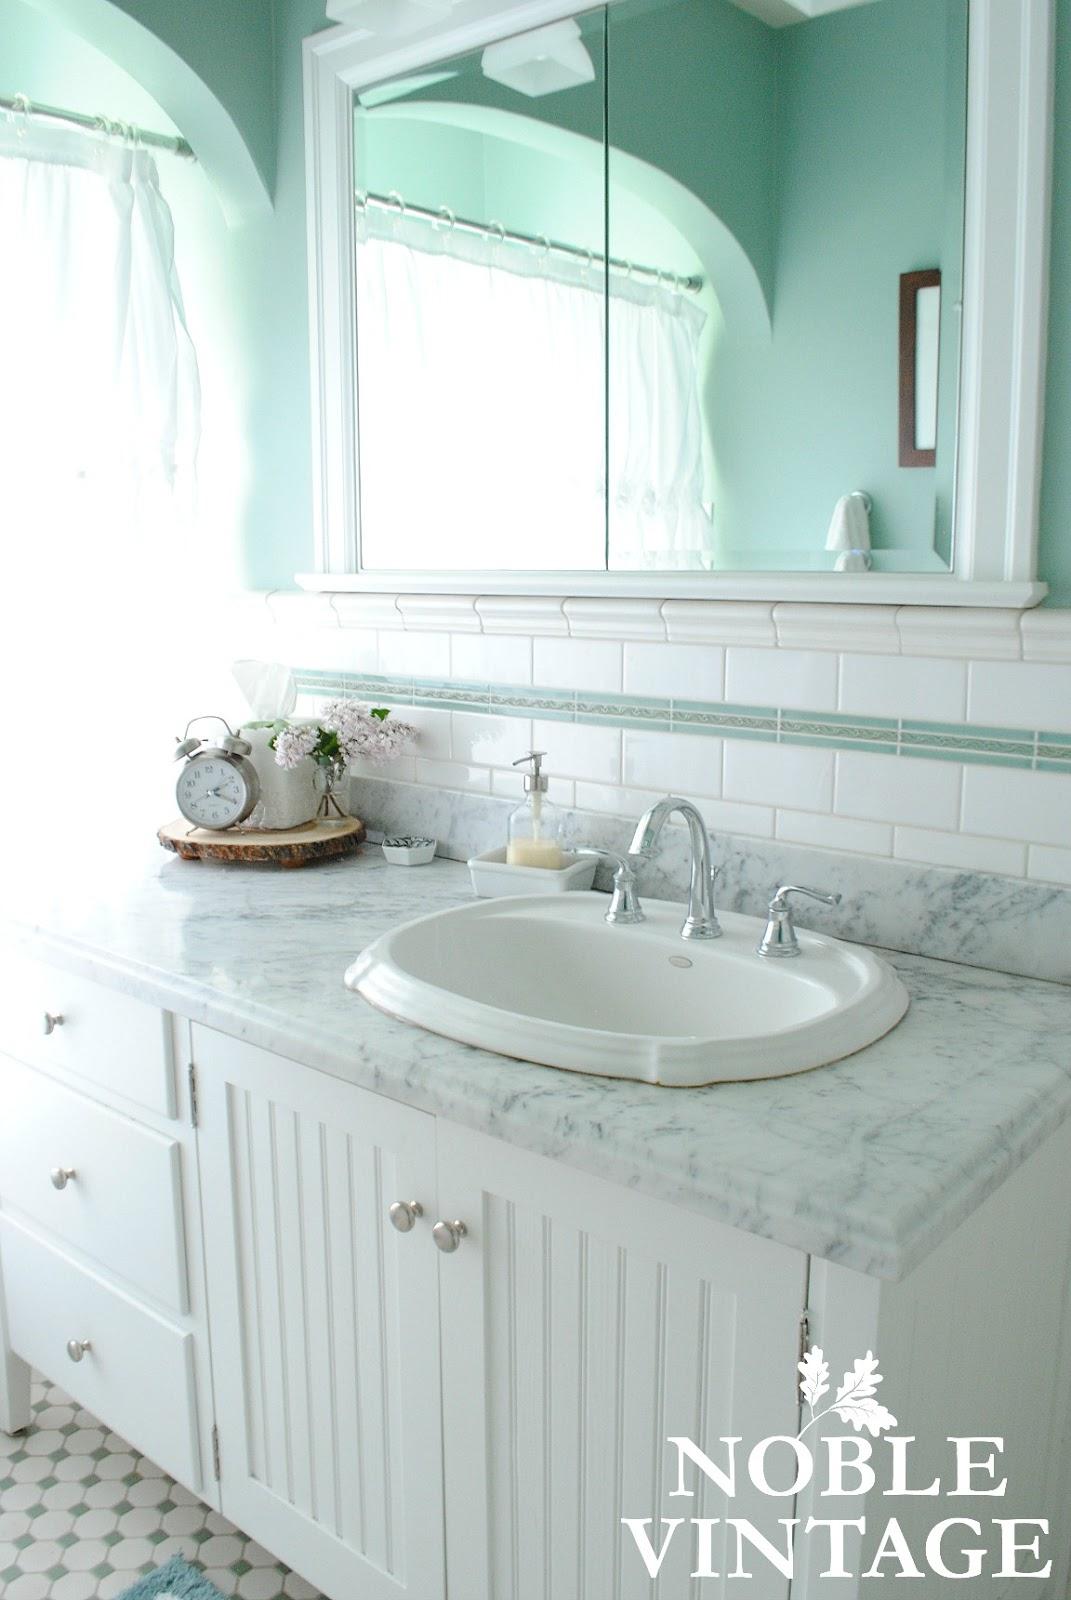 cottage vintage bathroom - Noble Vintage